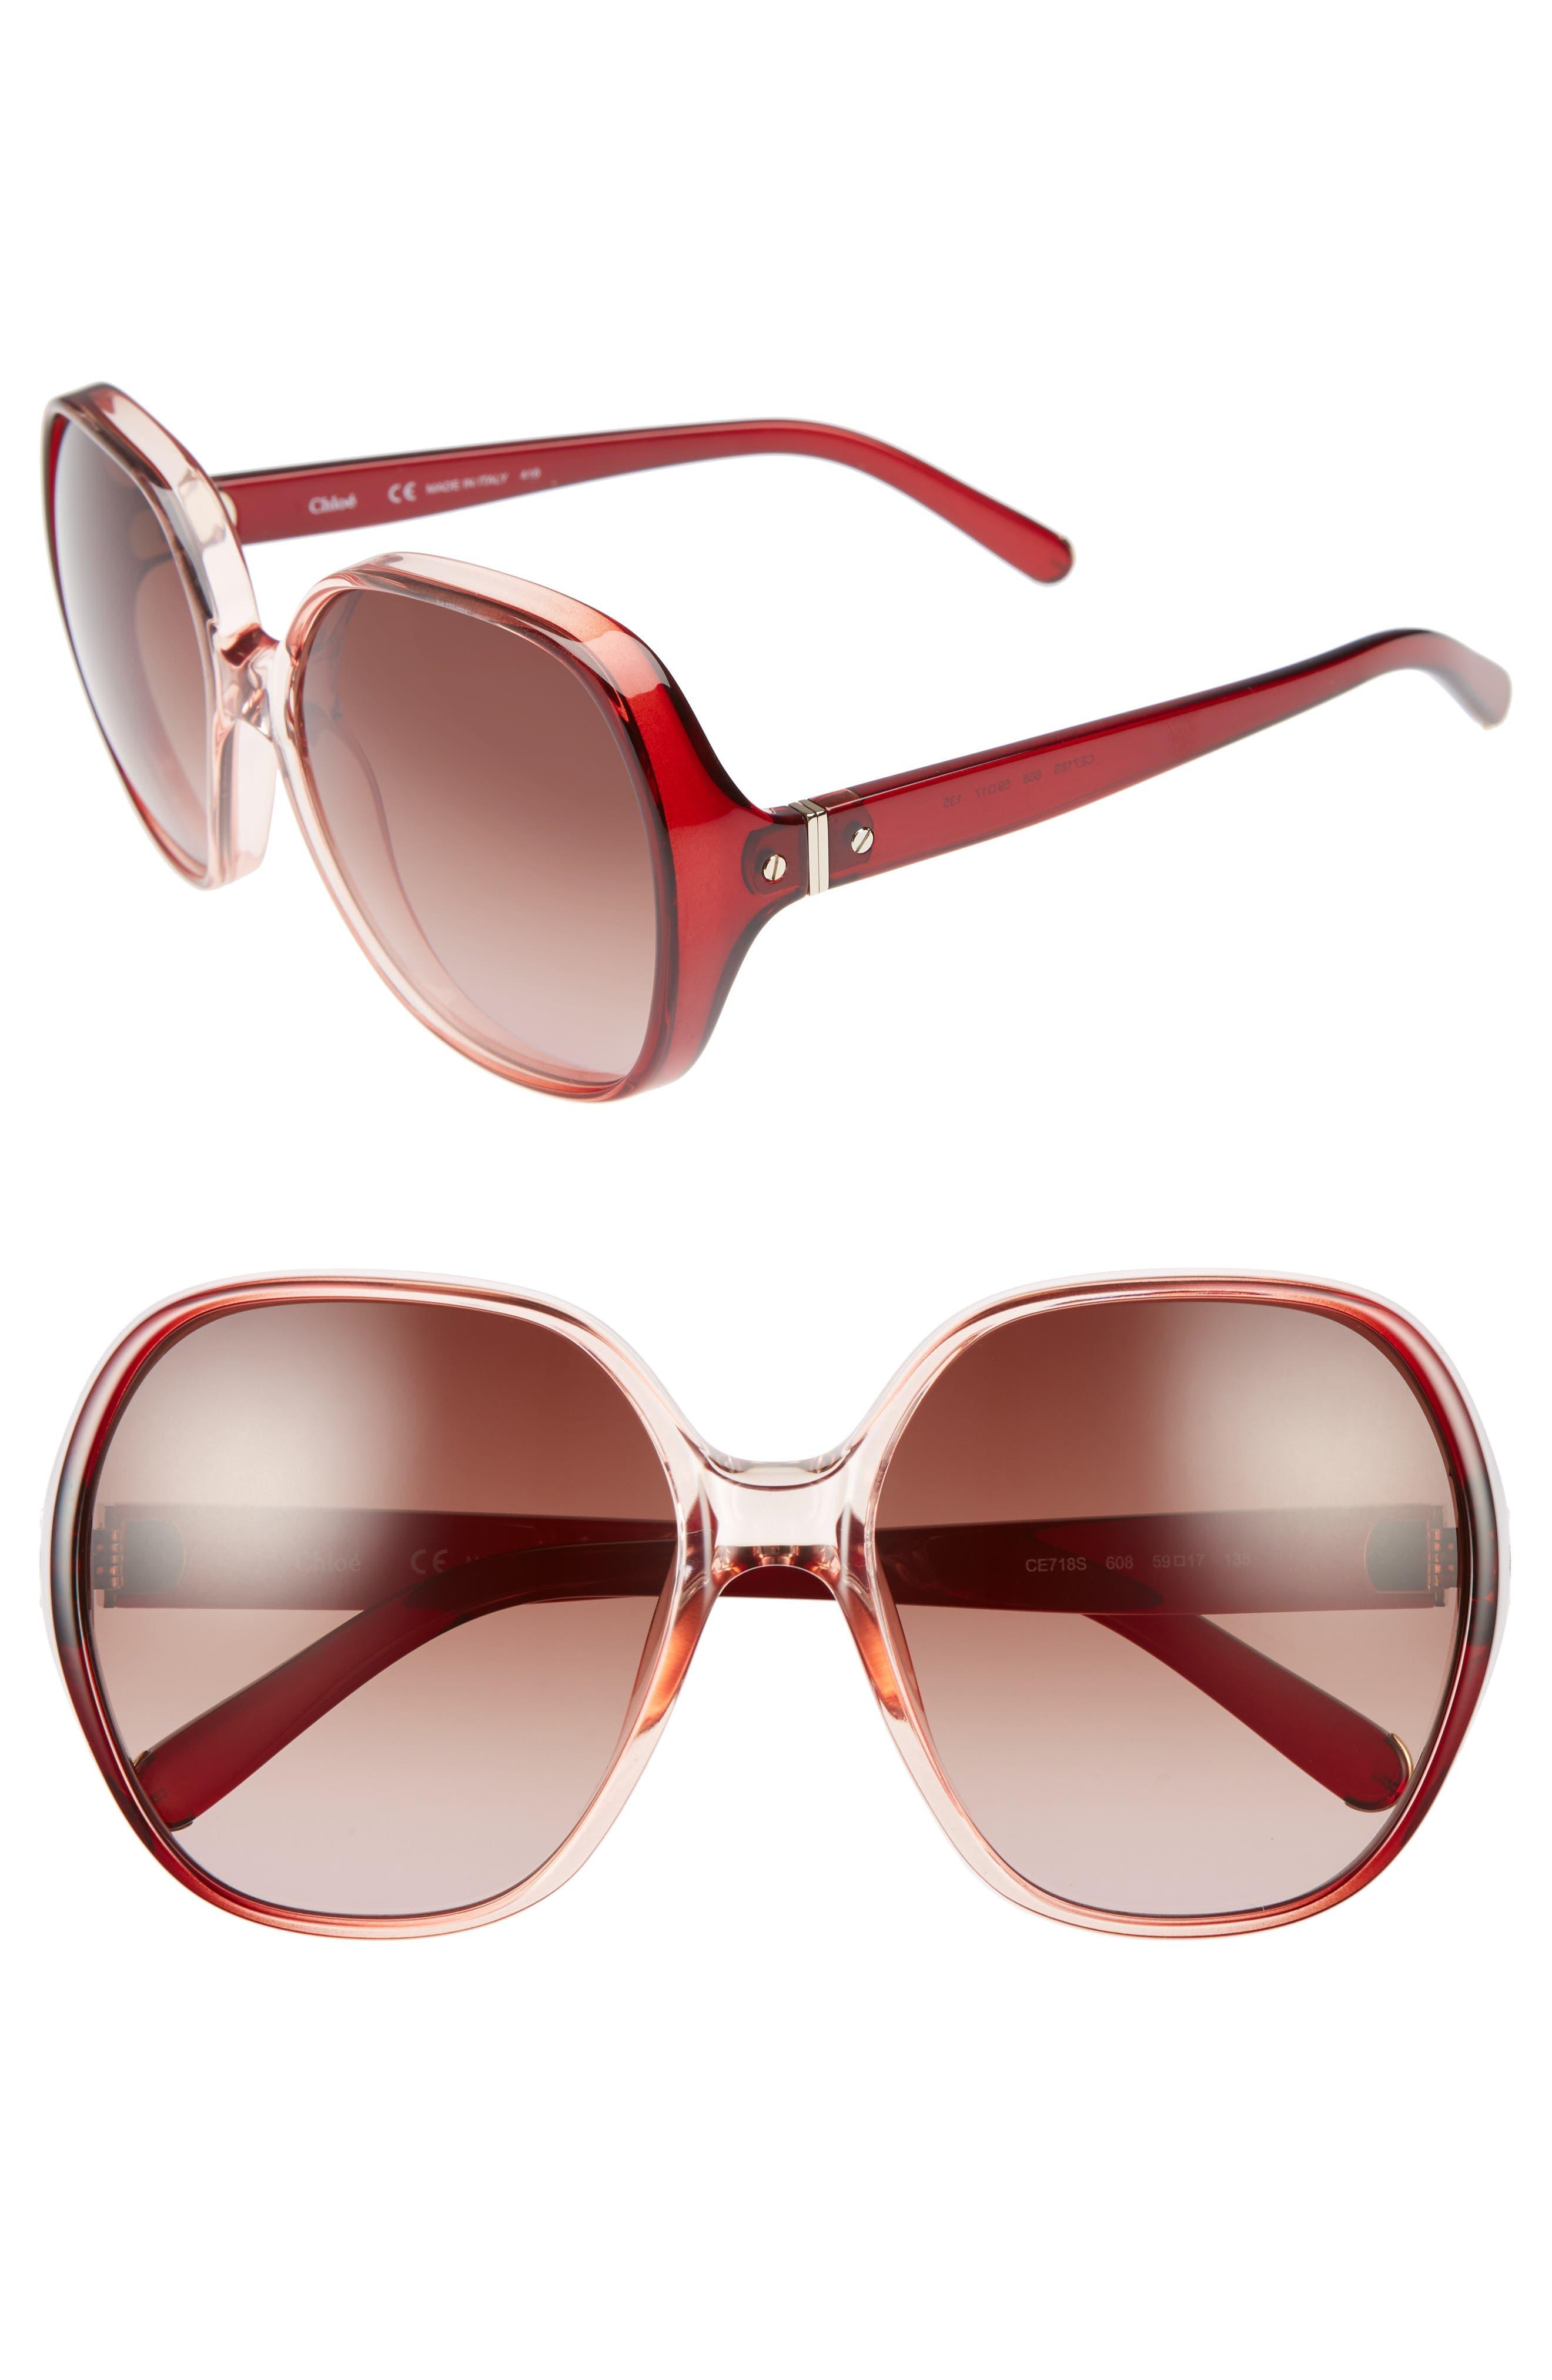 CHLOÉ Misha 59mm Gradient Round Retro Sunglasses